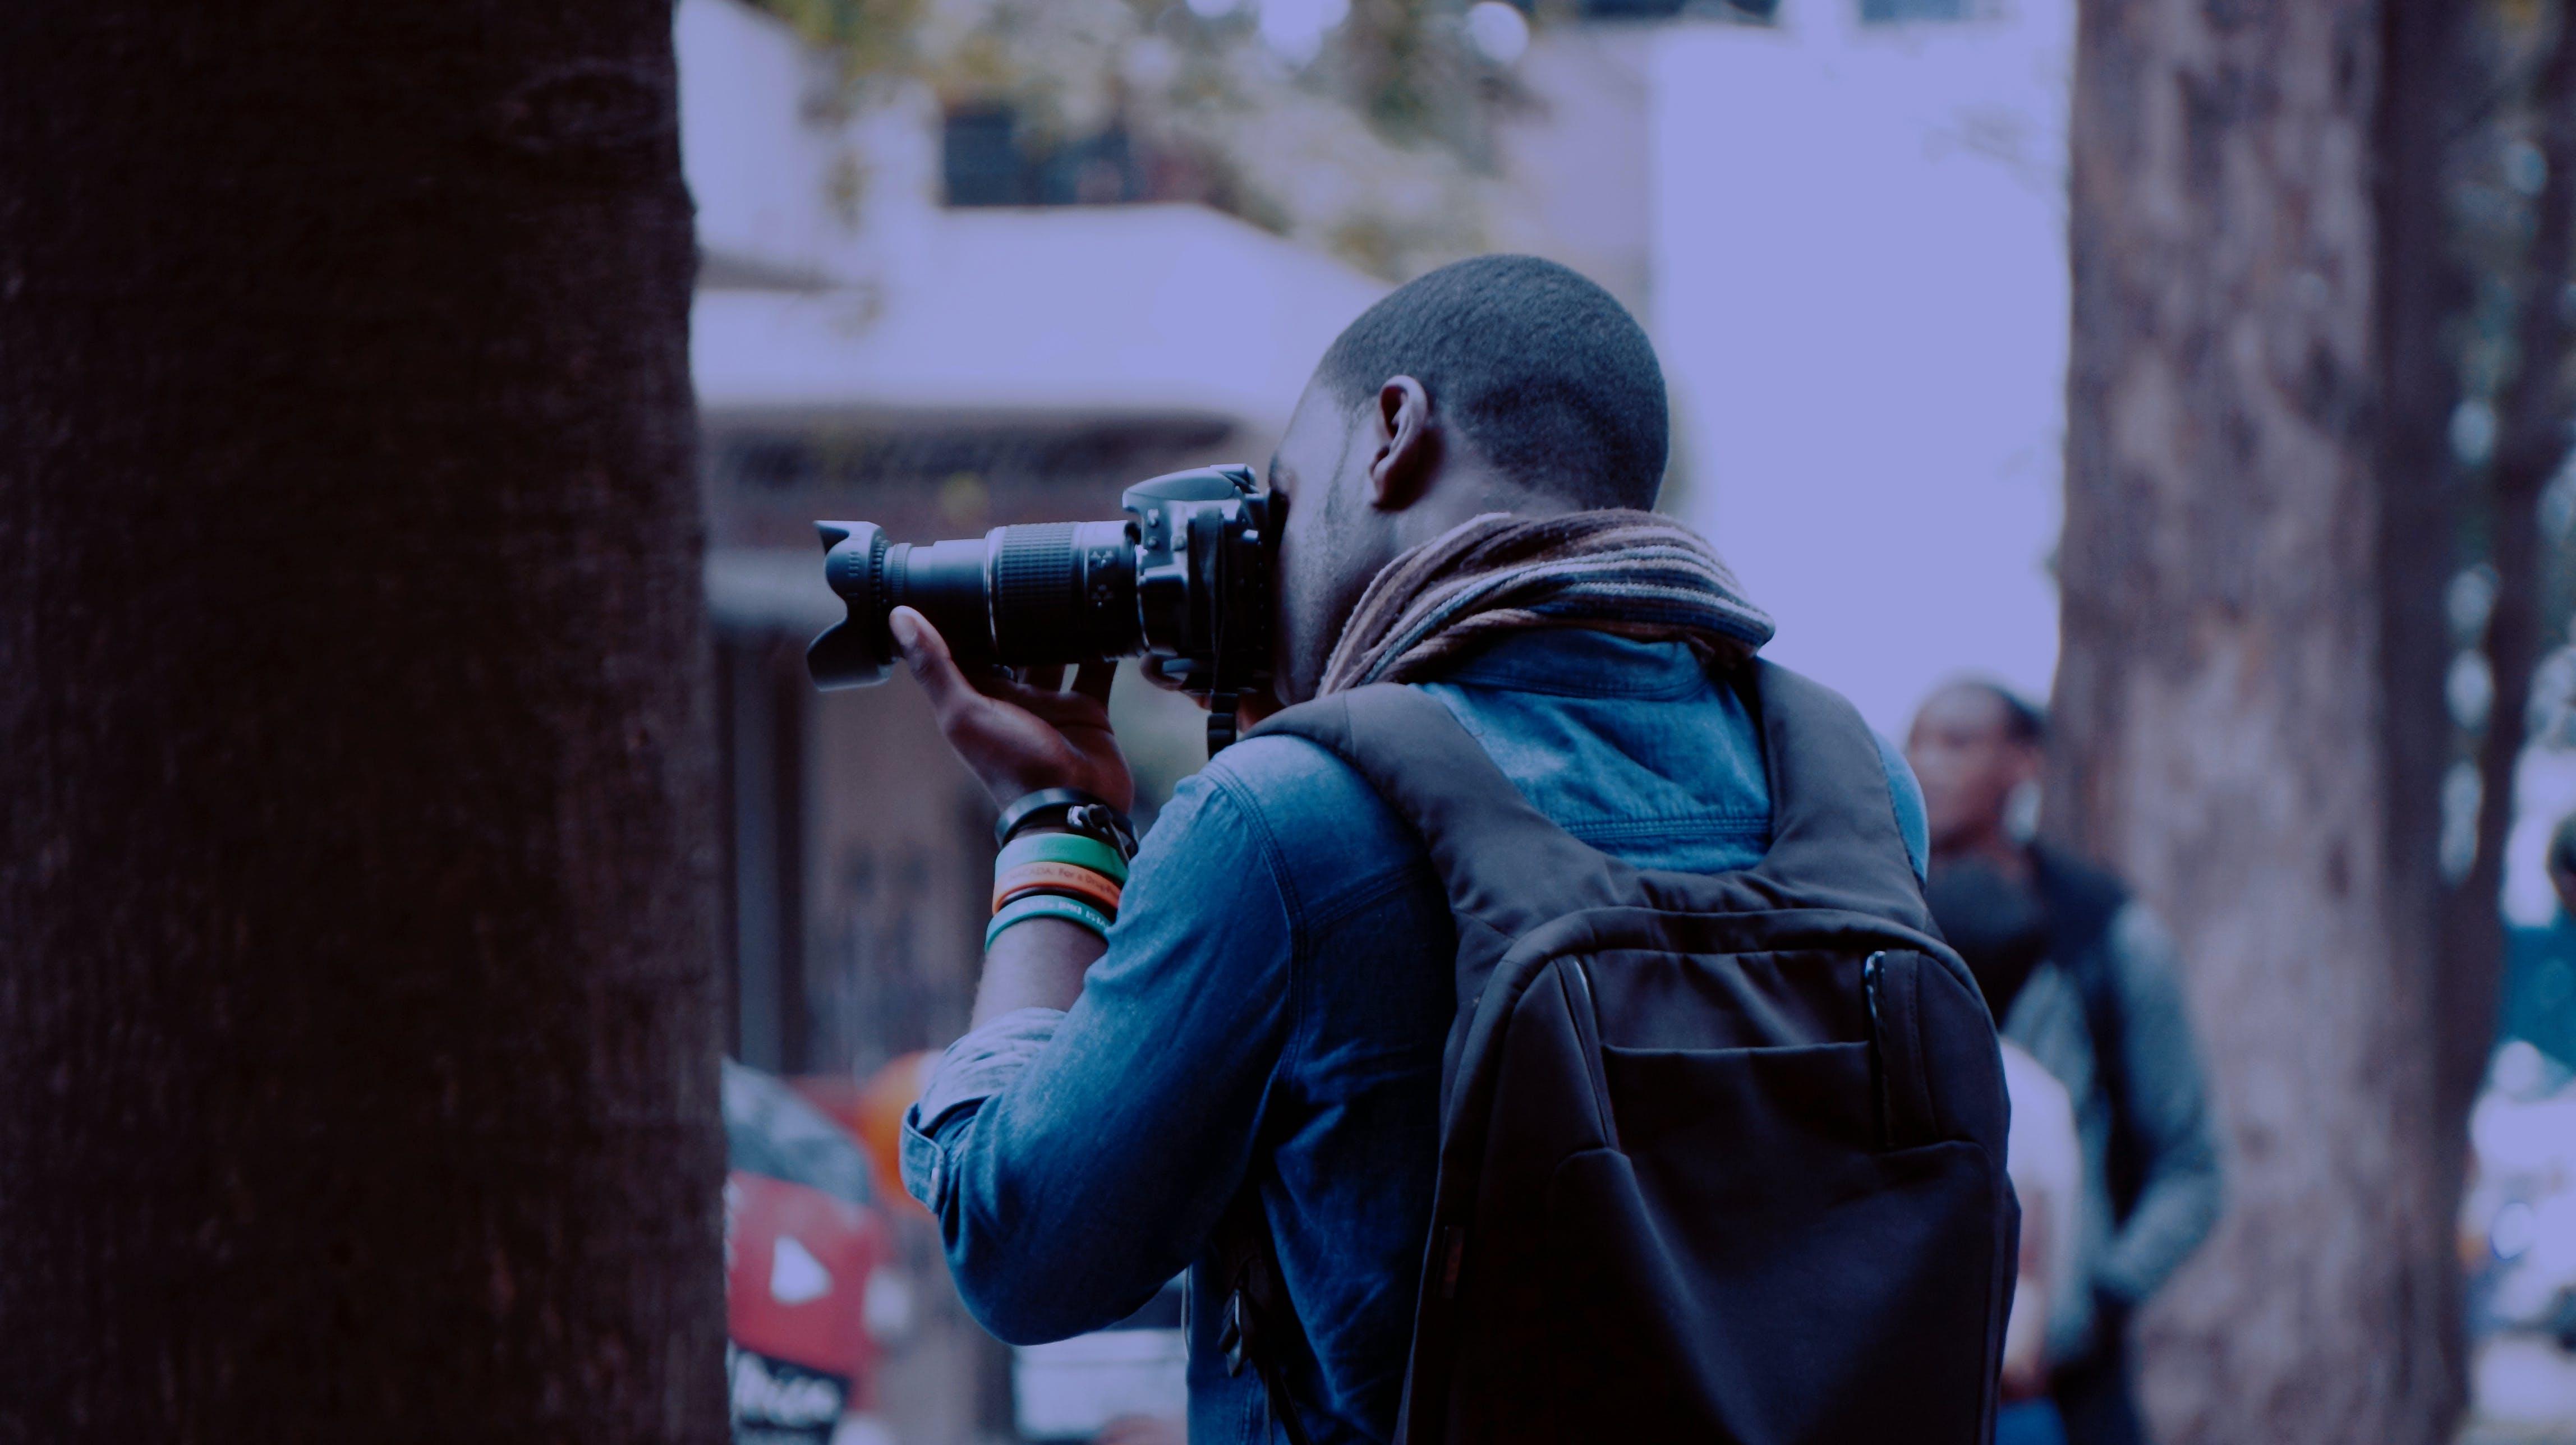 Free stock photo of camera, photographer, photography, black